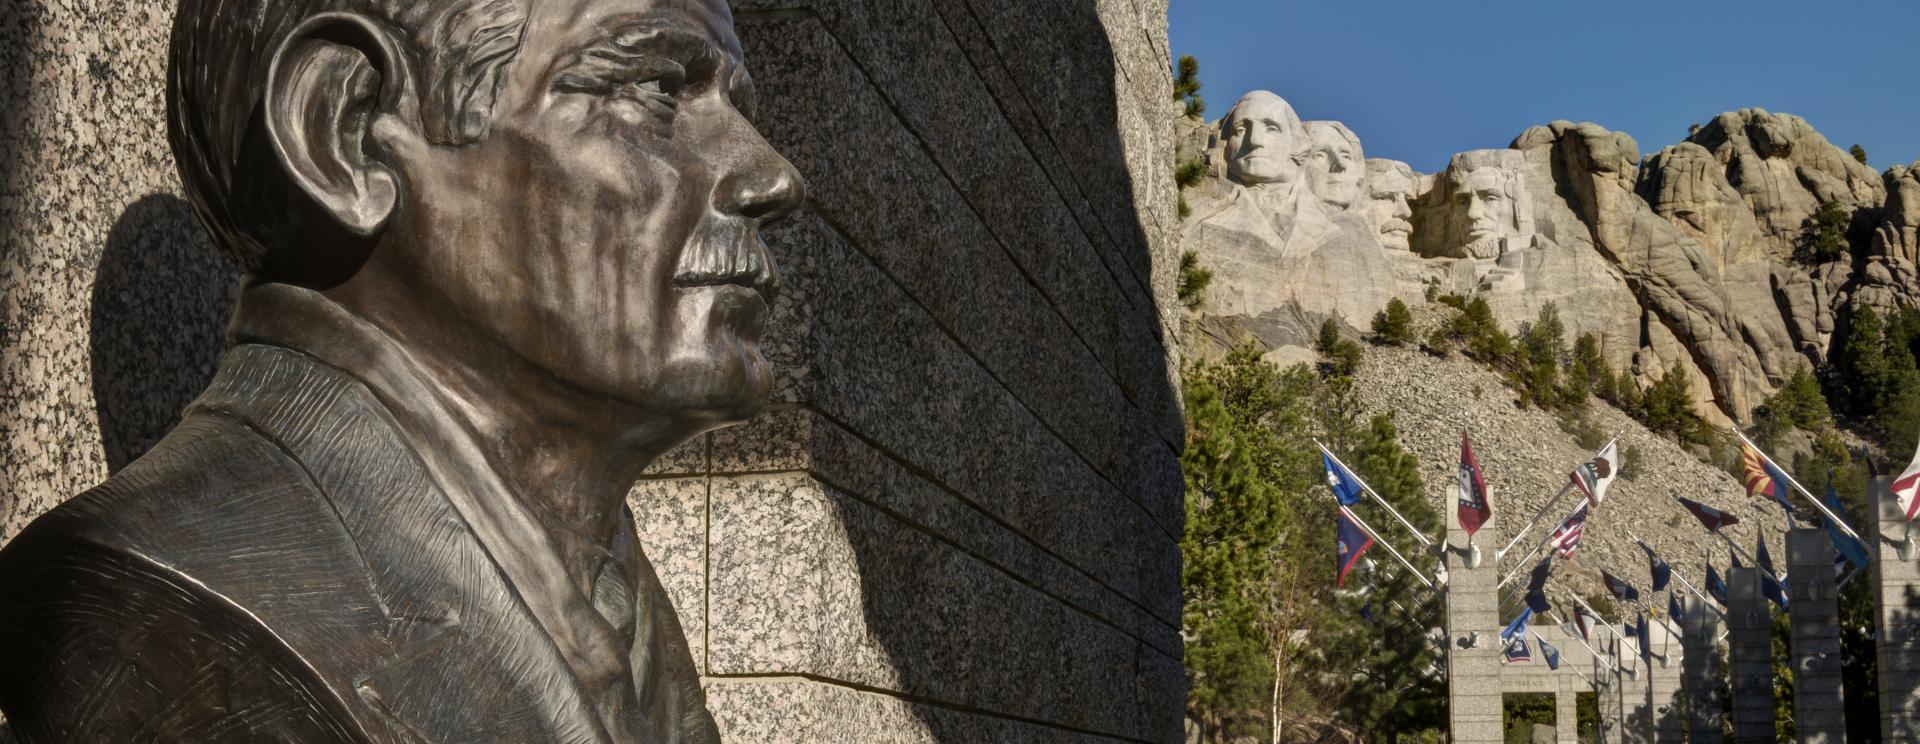 Rushmore Borglum Story